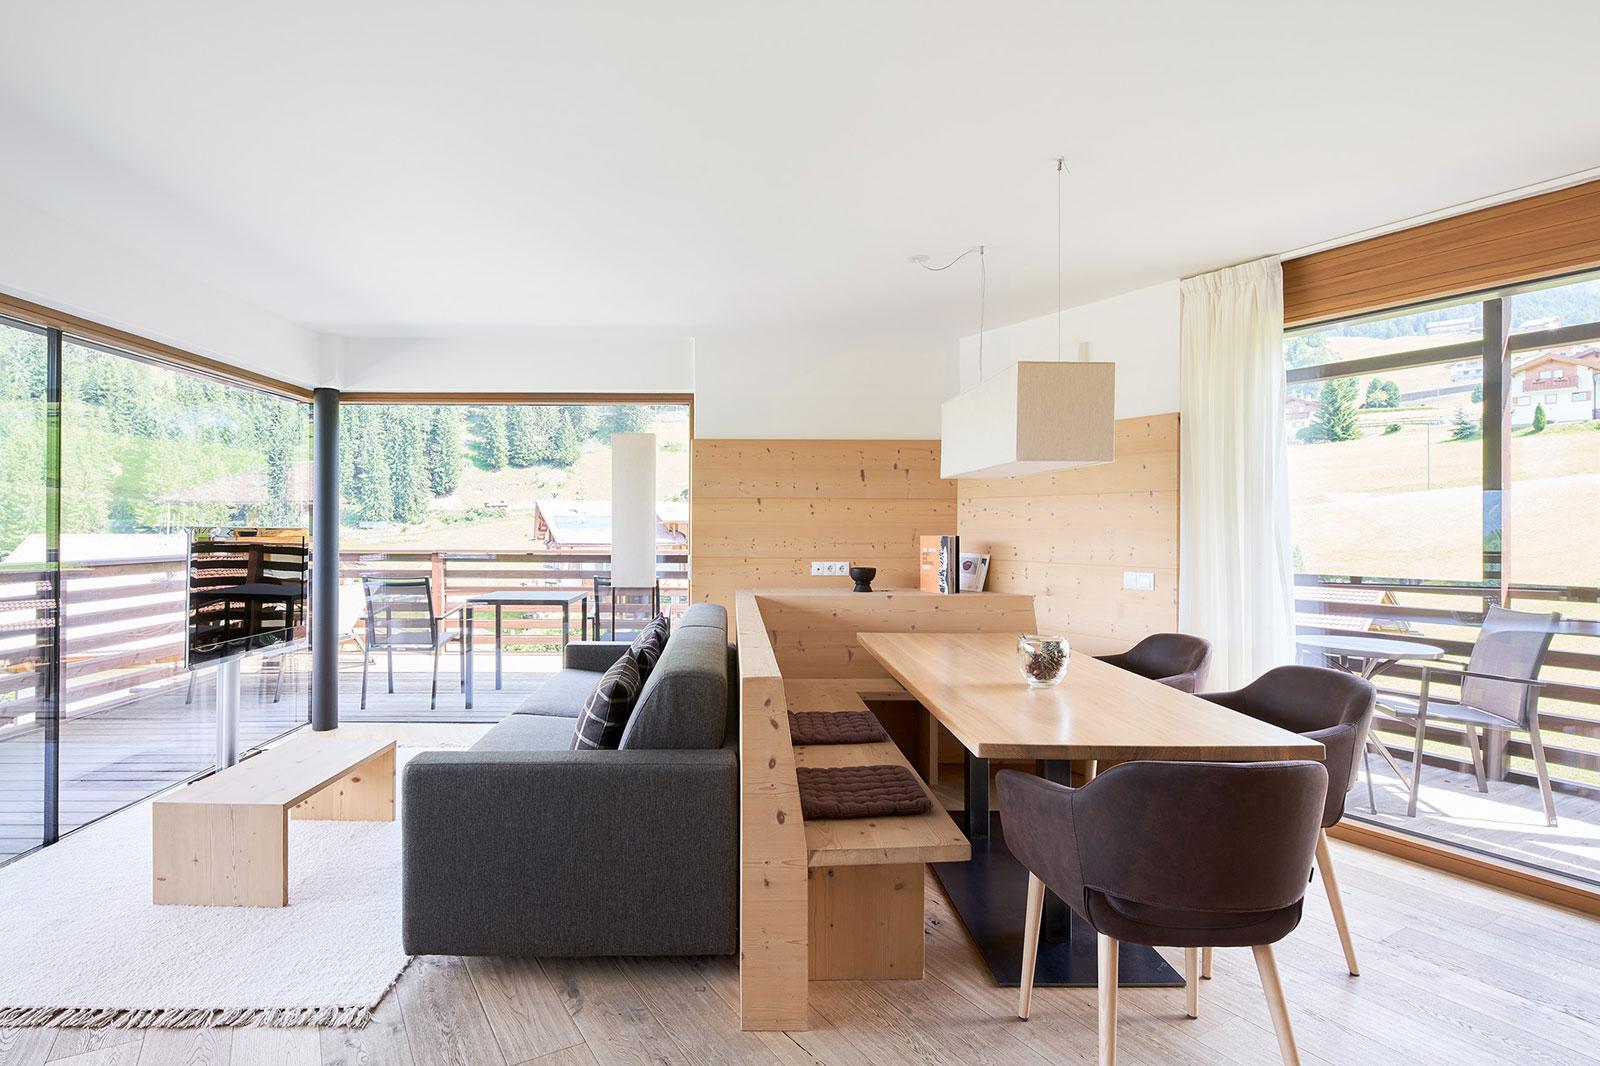 Vasca Da Bagno A Vista Prezzi : Design moderno e lifestyle alpino al saleghes mountain residence a